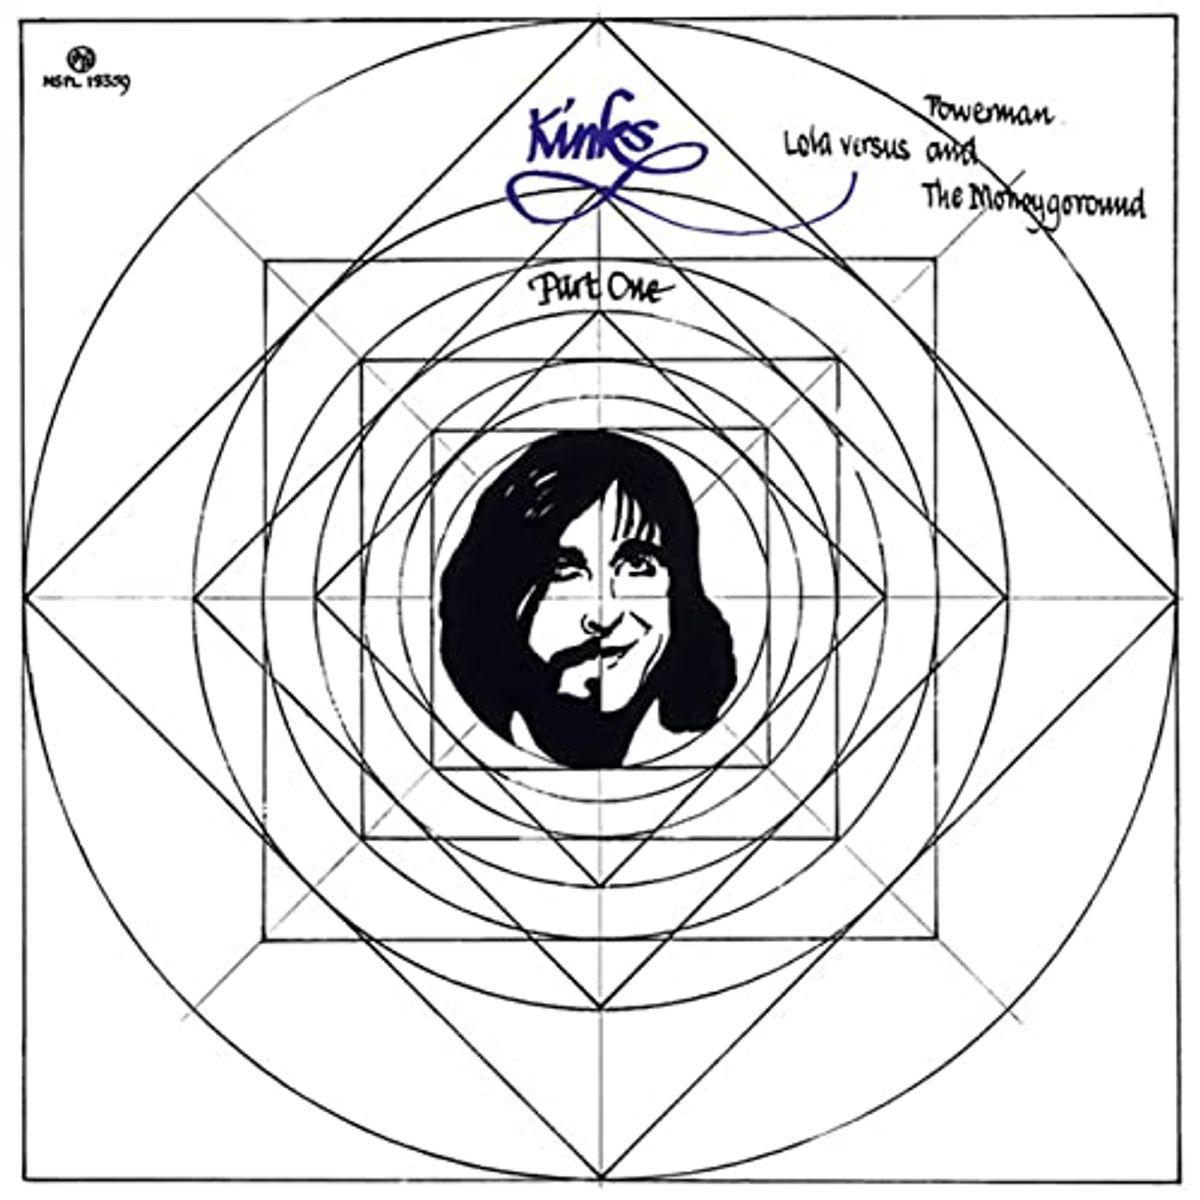 #FijnBesnaard - The Kinks - This Time Tomorrow (1970)